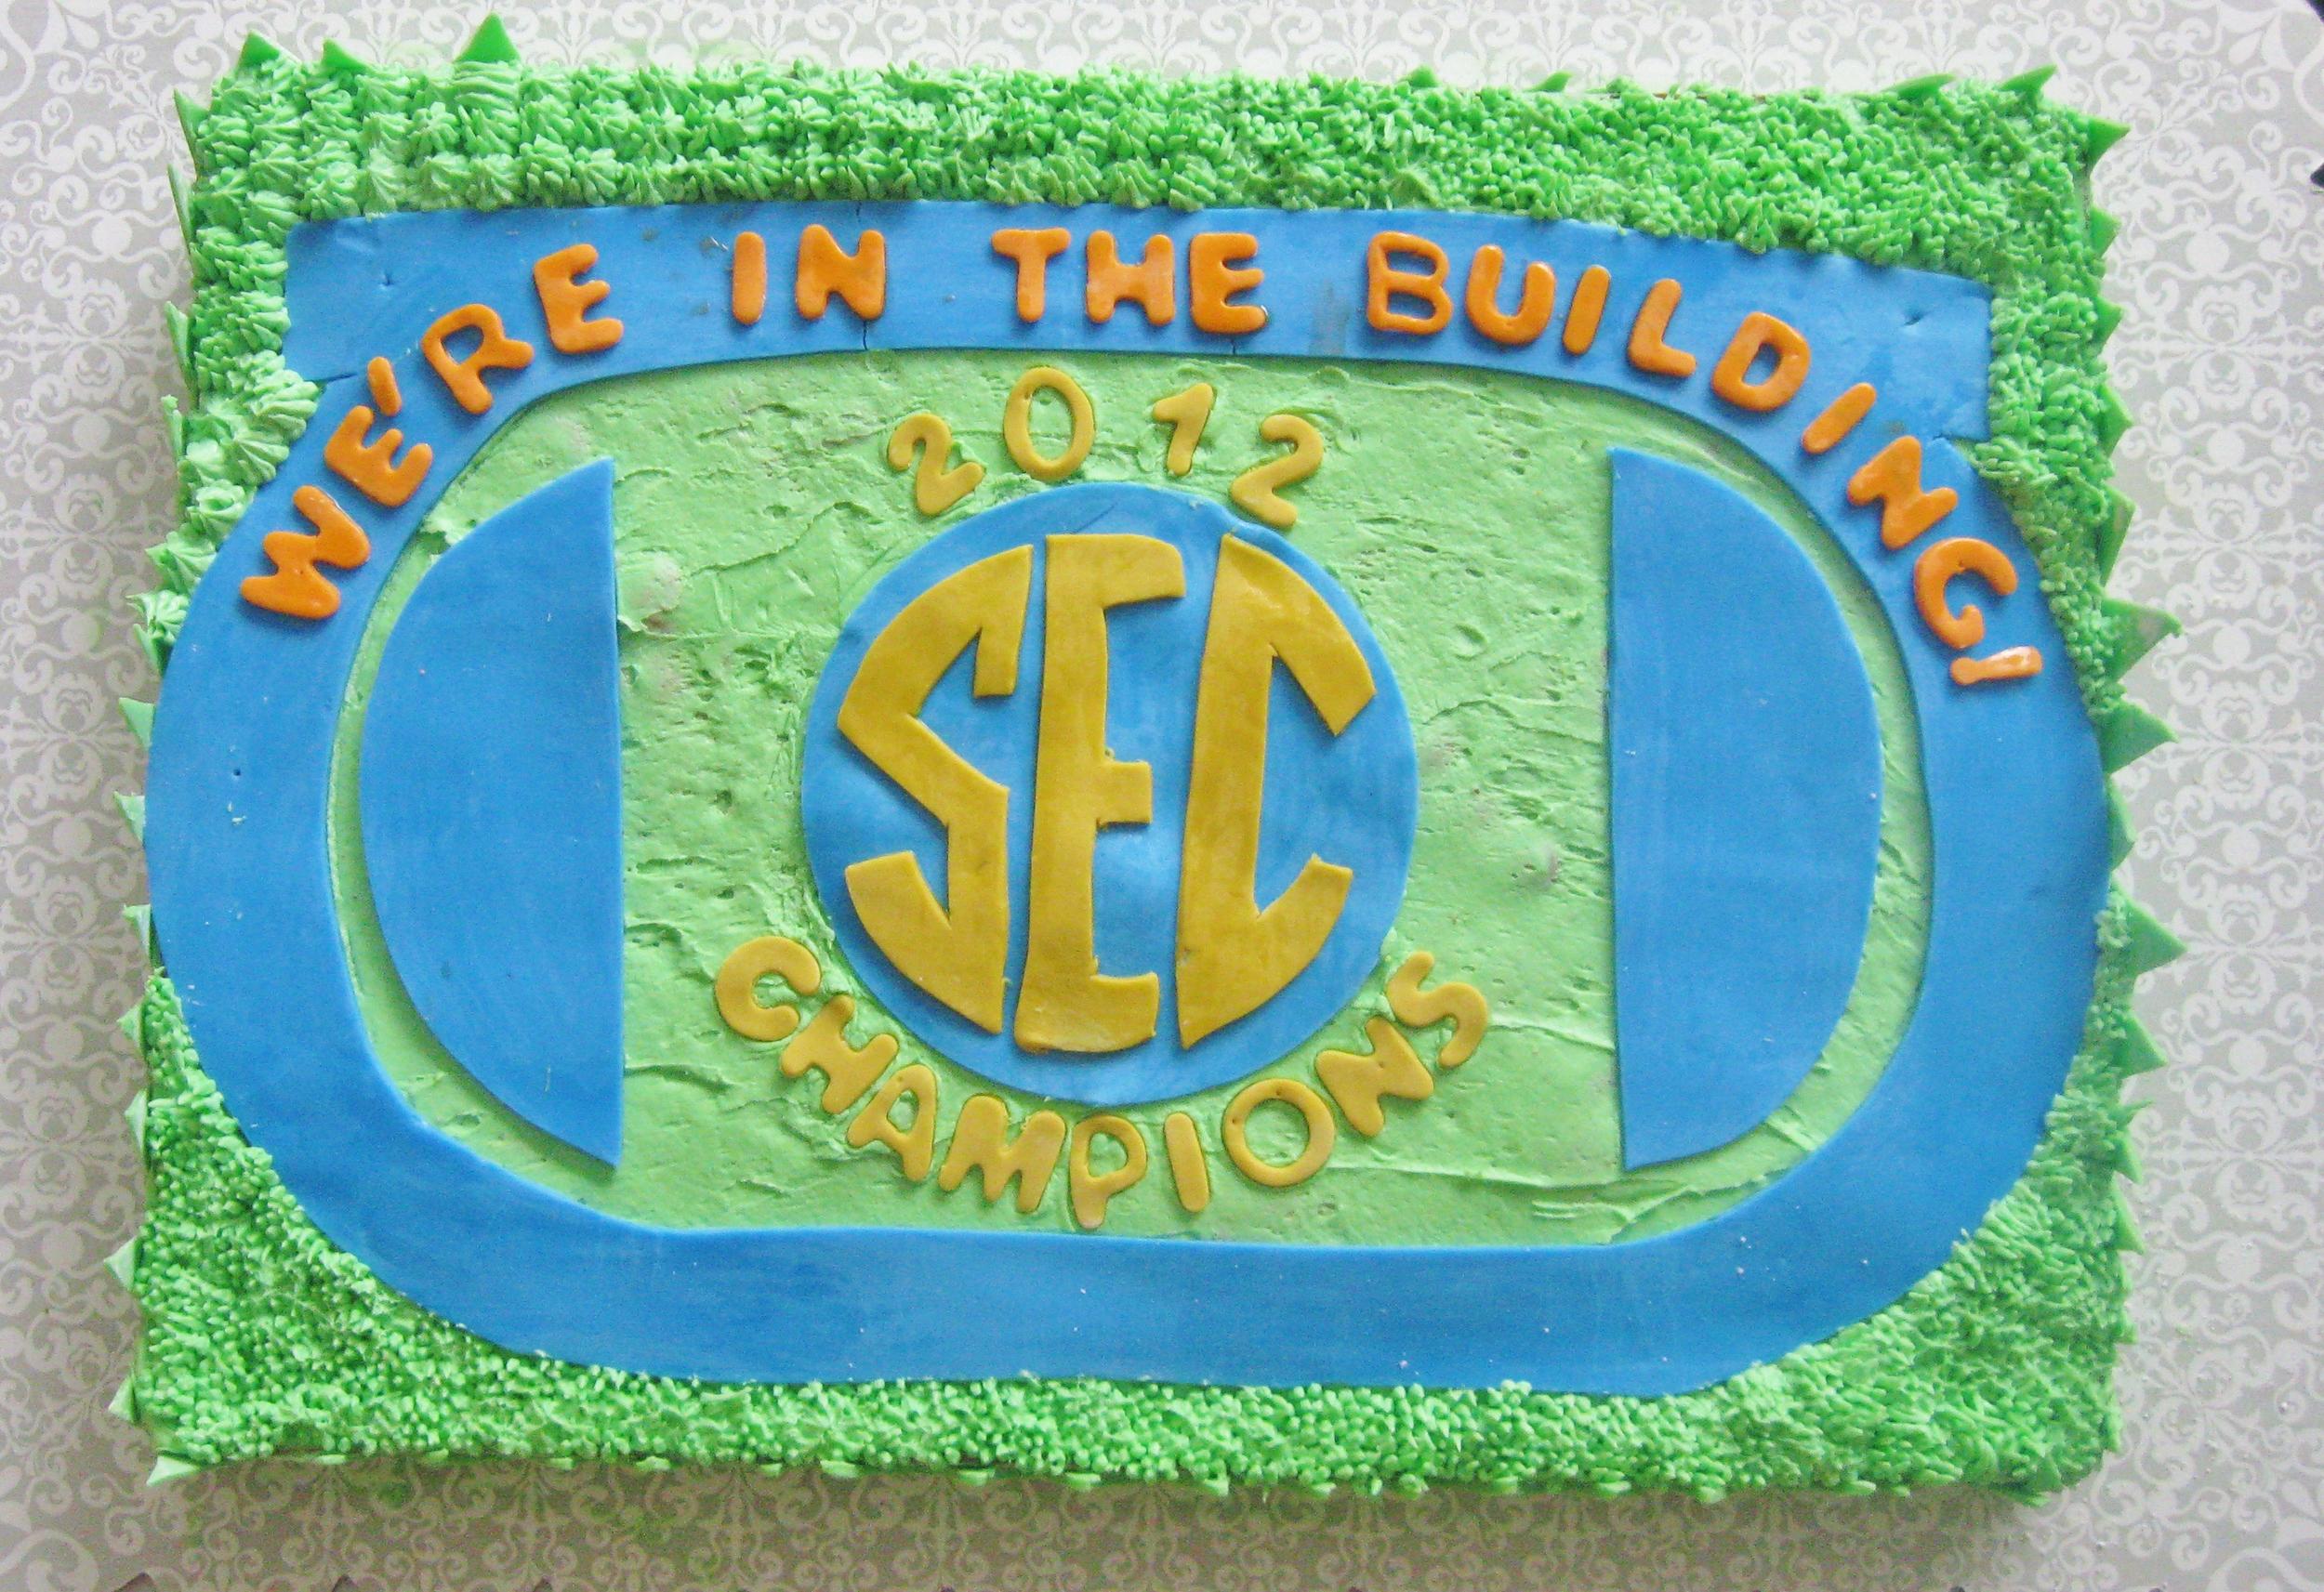 SEC Championship Cake